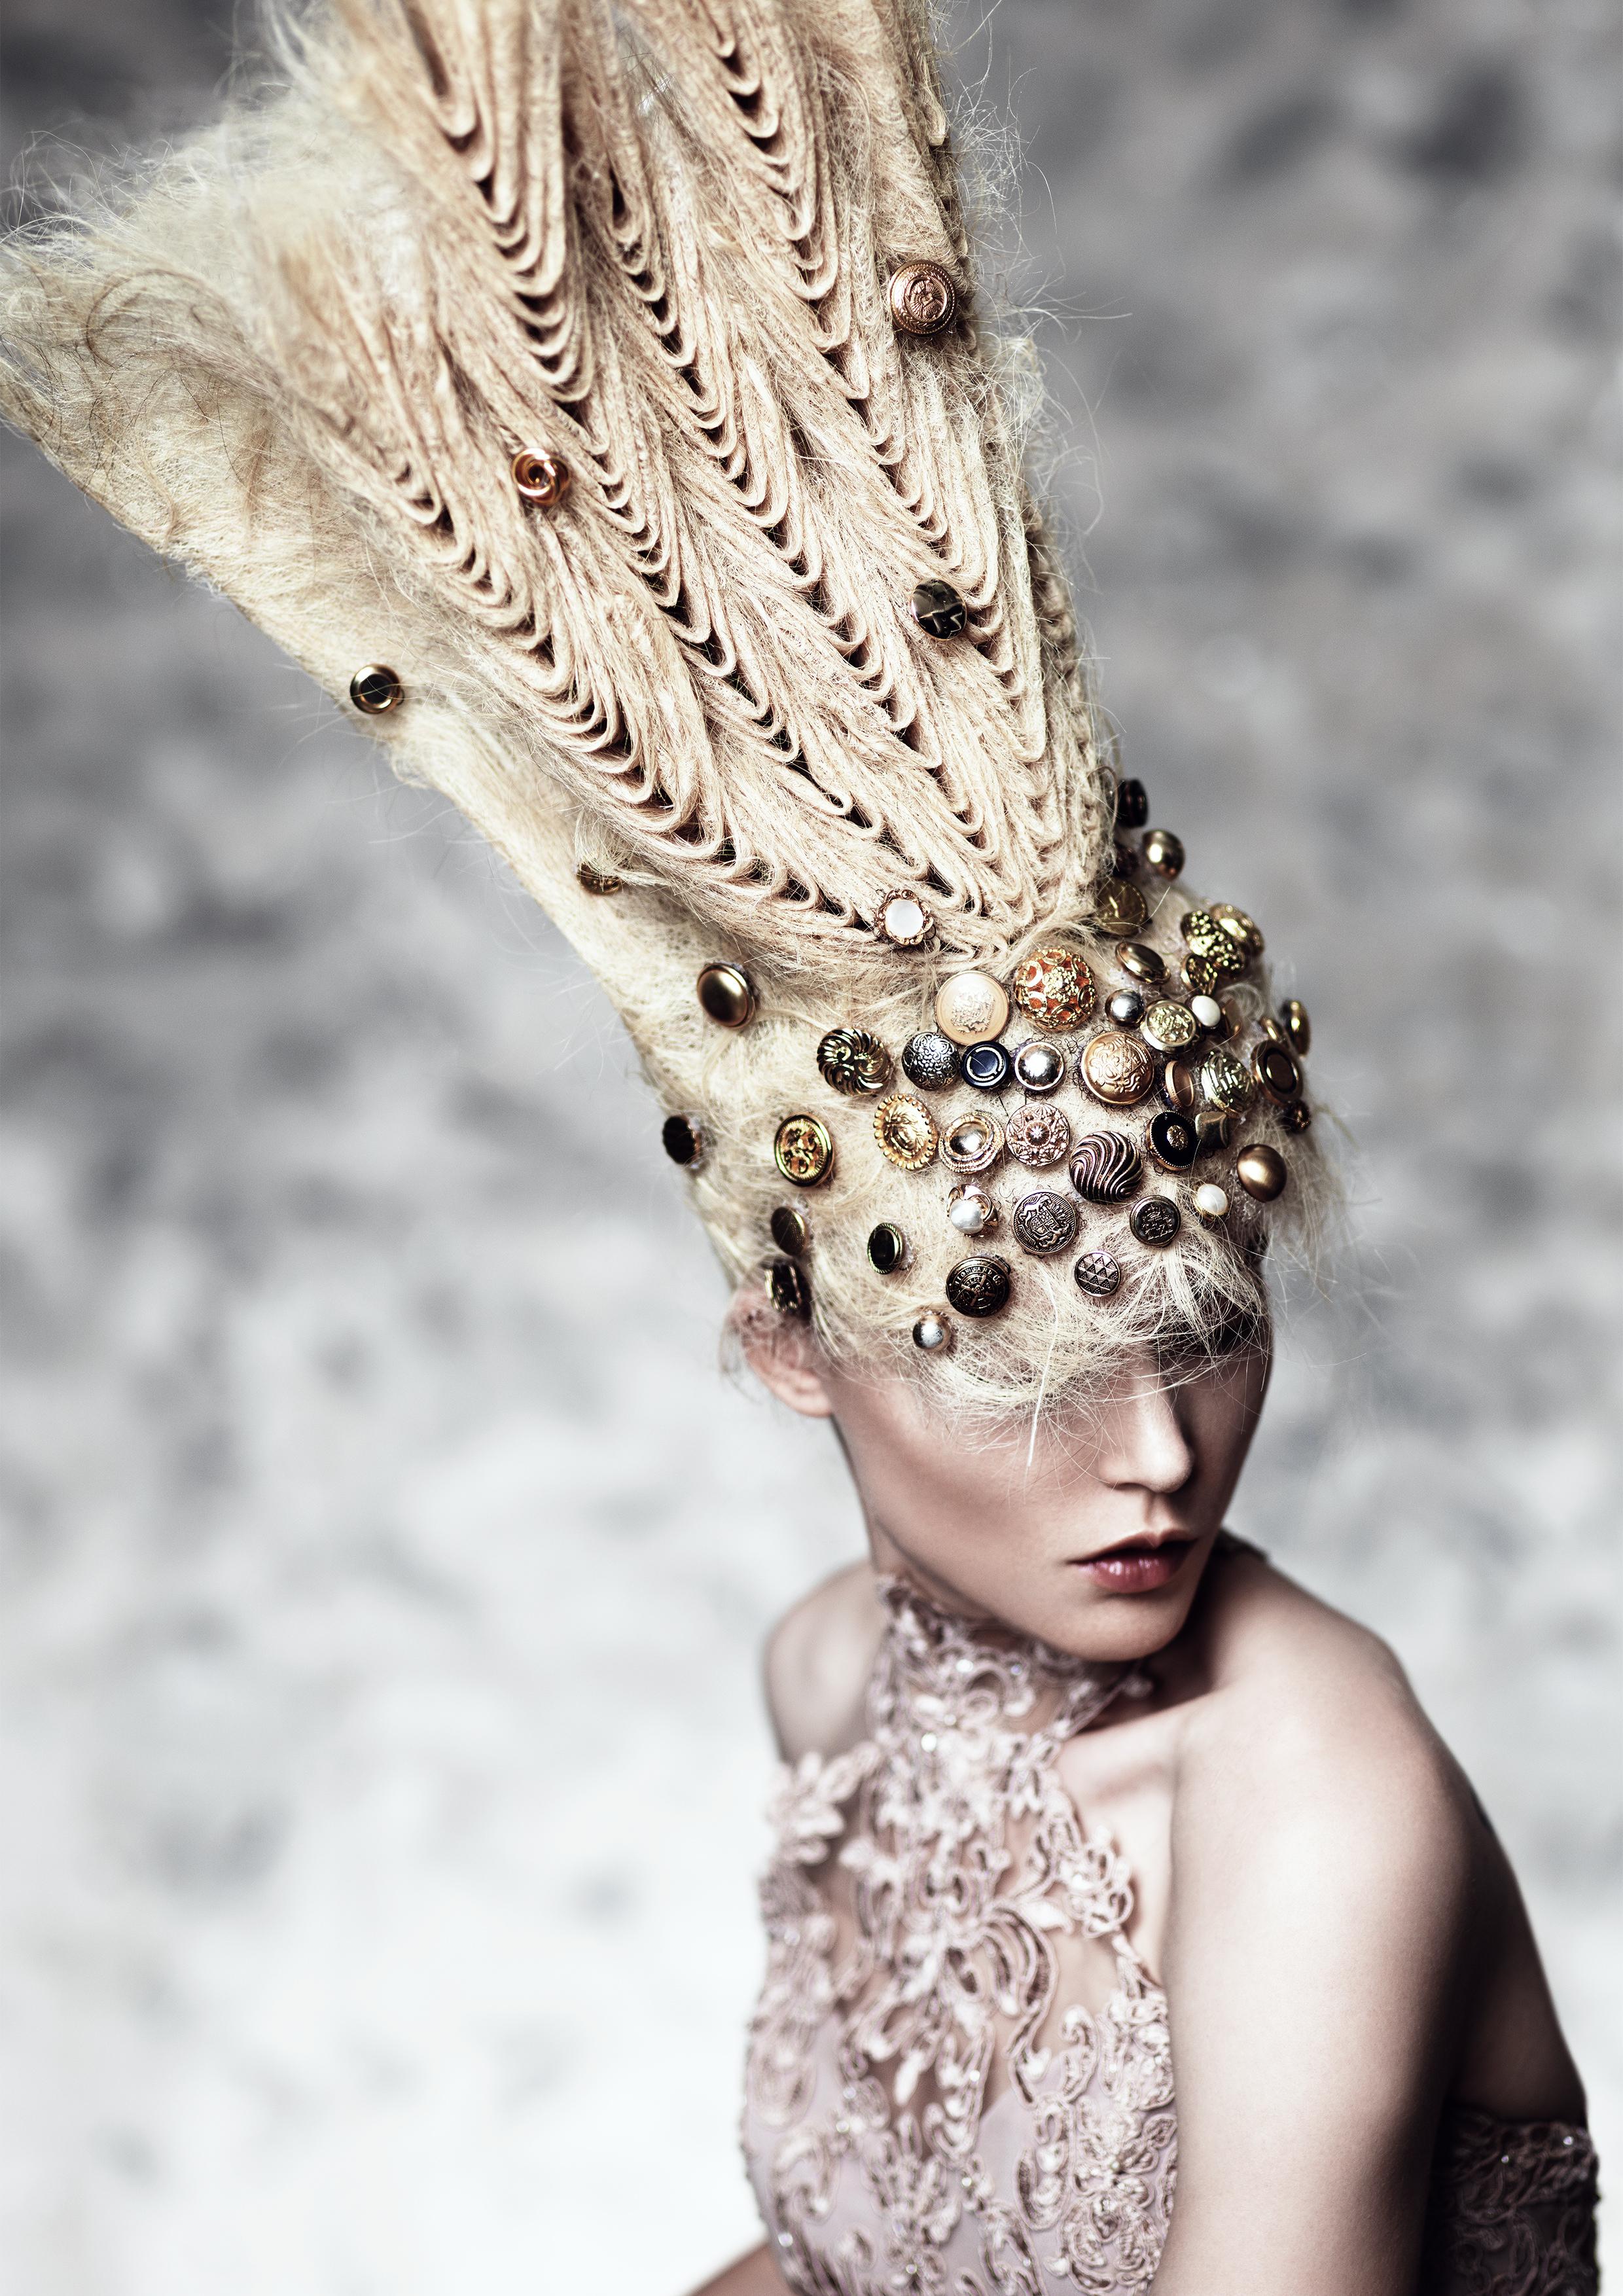 Royals_Cherie Falco_highres_6.JPG